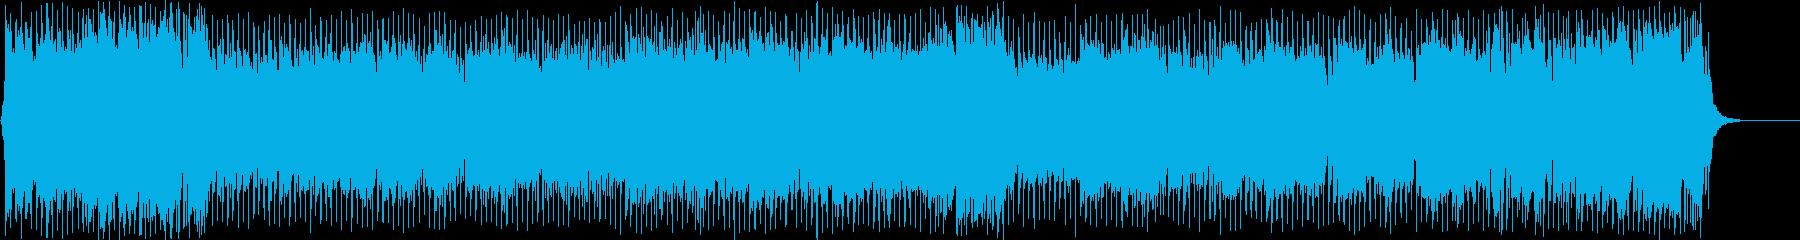 SAFARI ADVENTUREの再生済みの波形